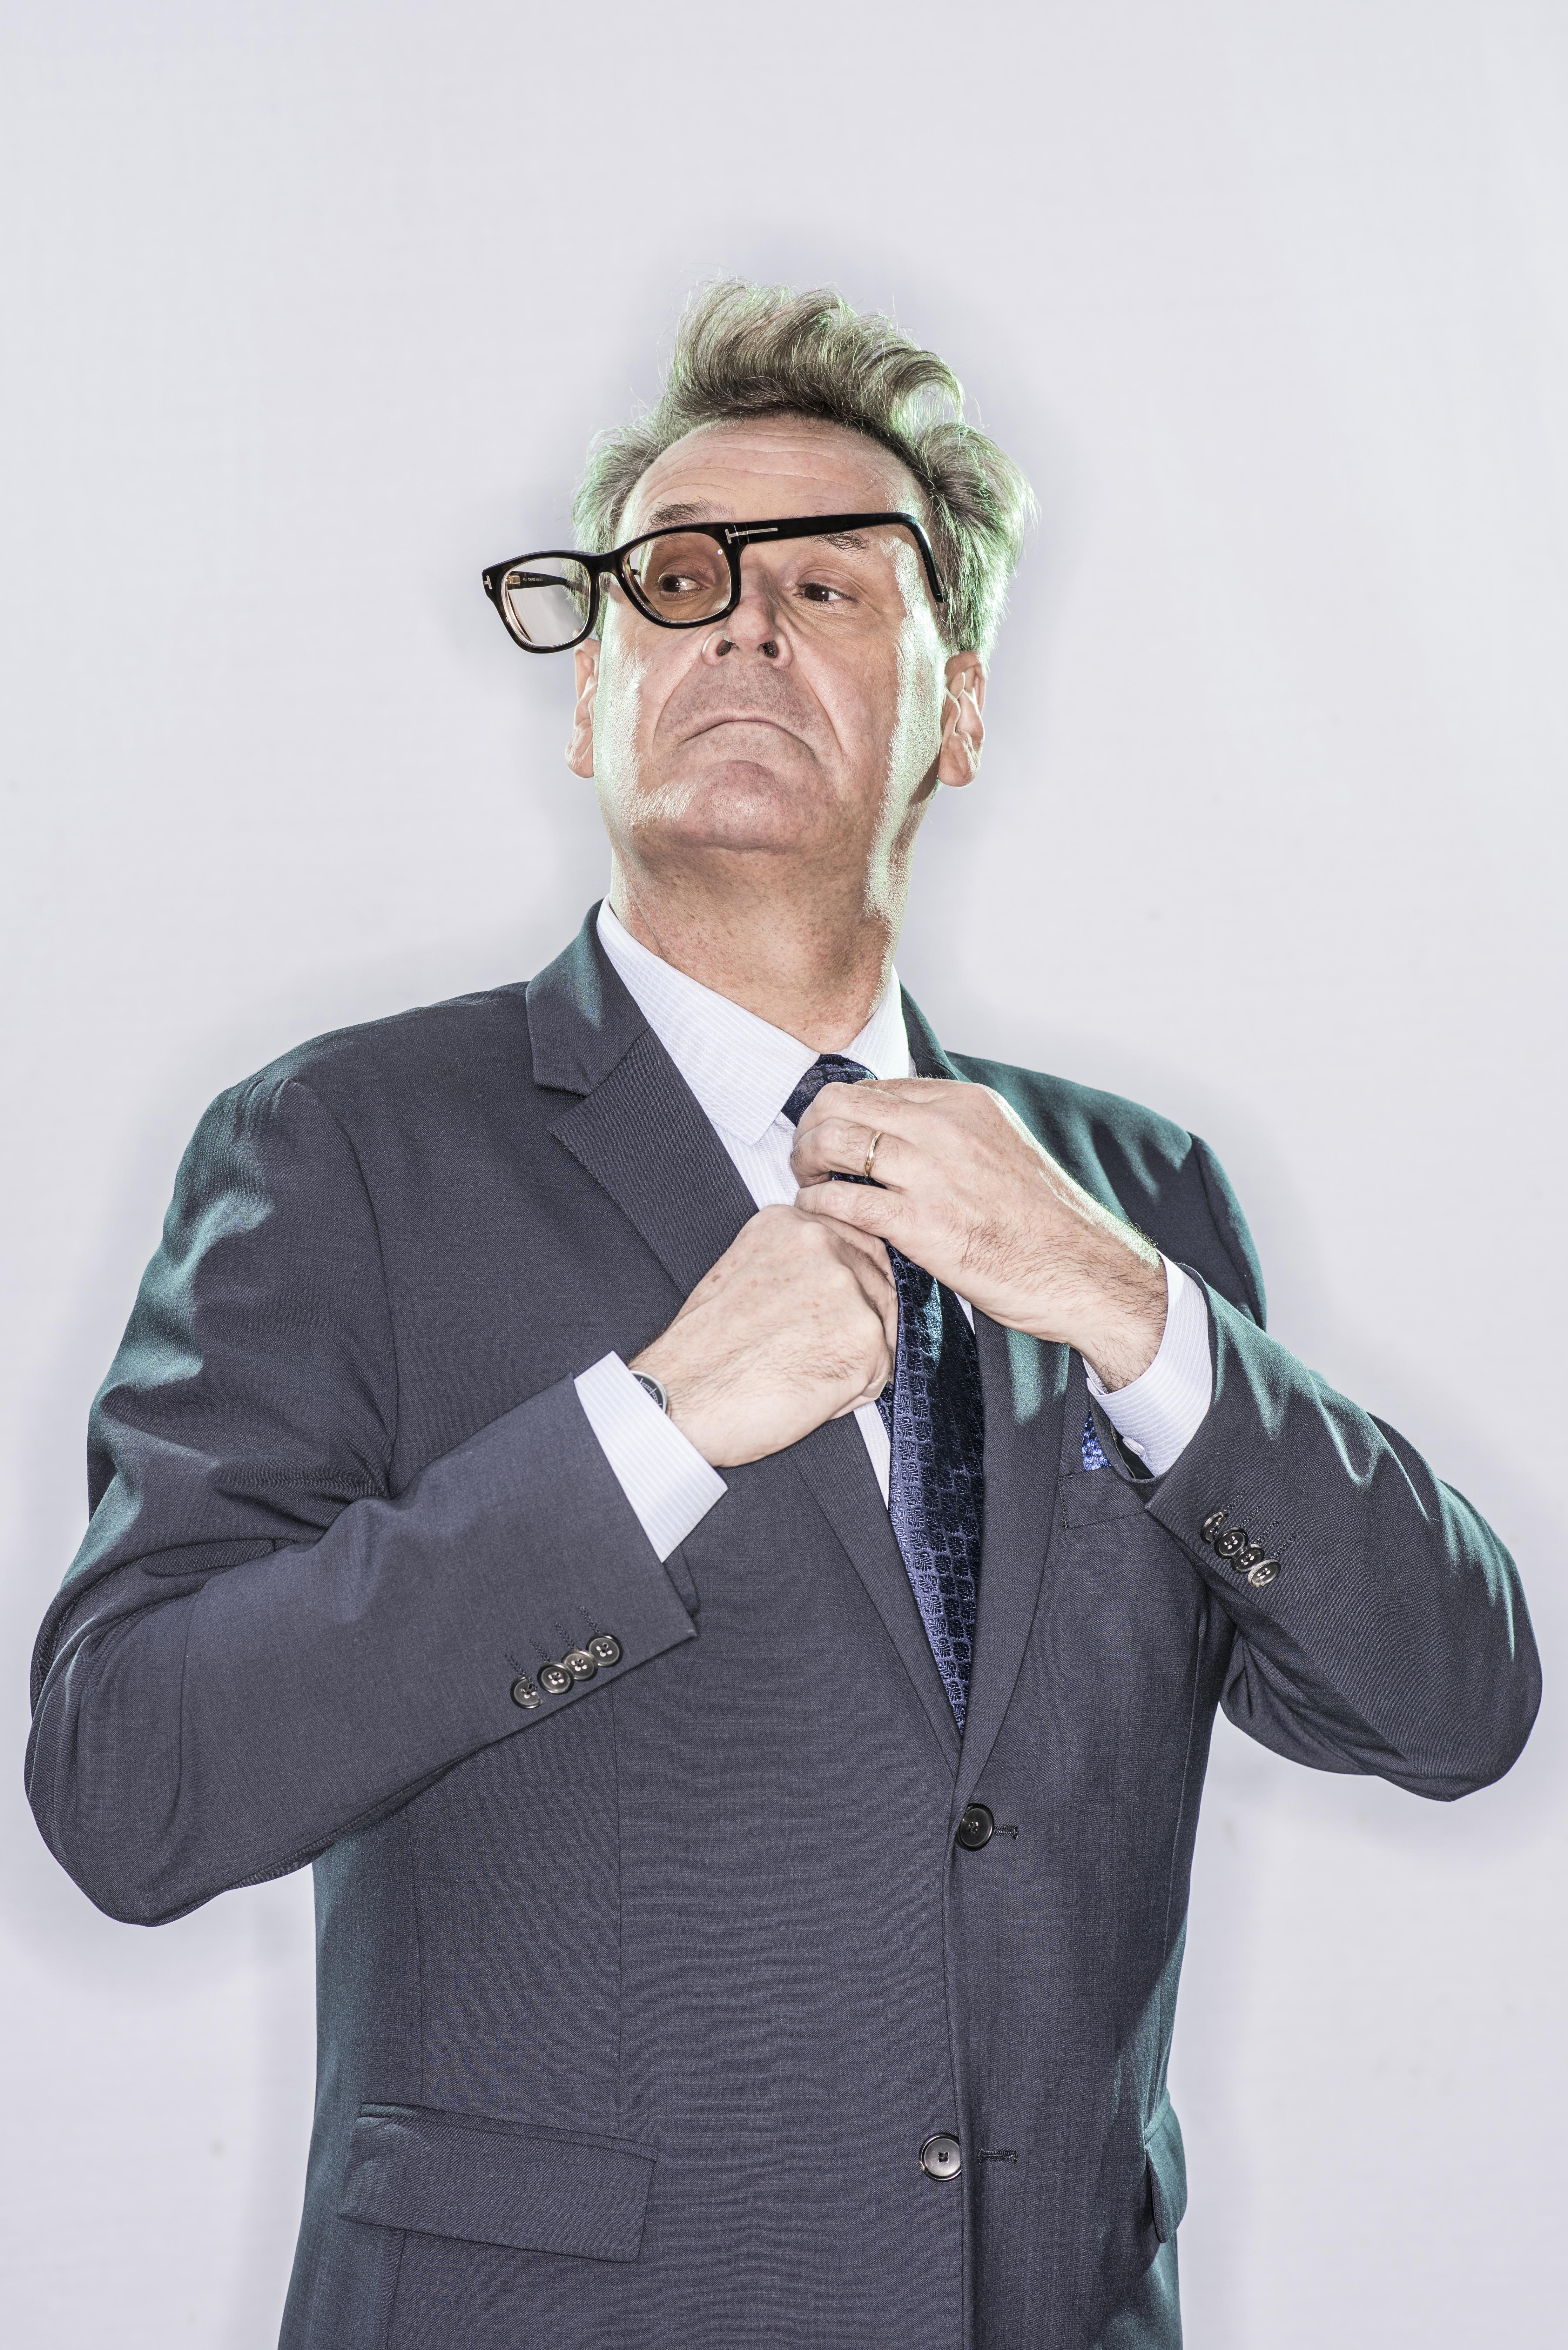 Corporate Improv Comedians Greg Proops